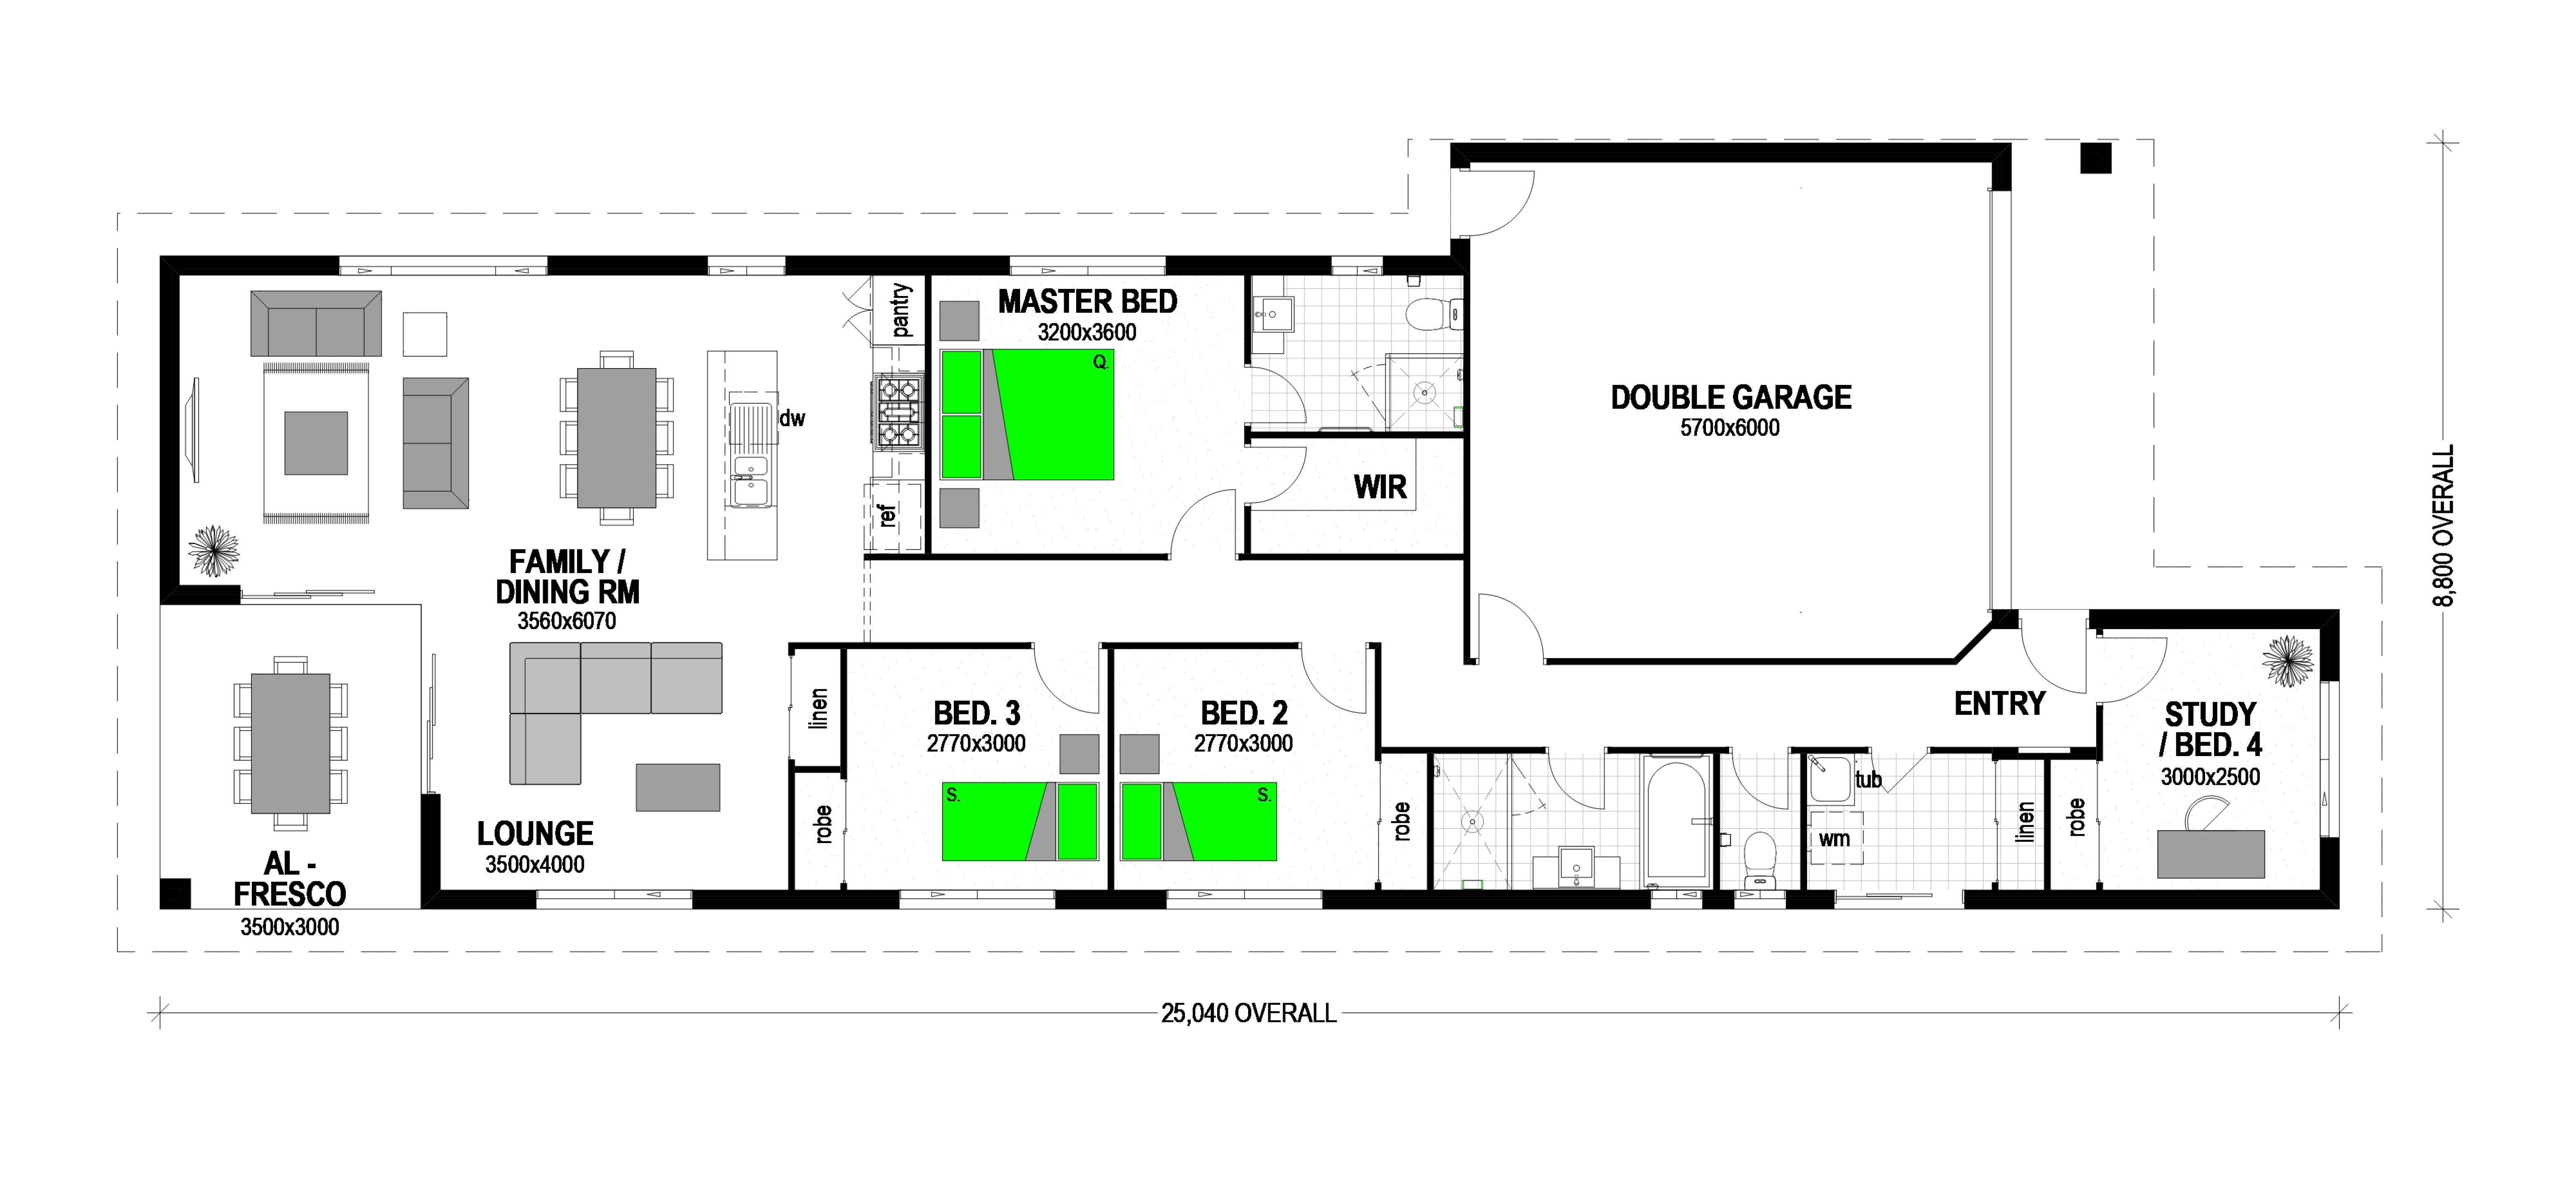 LOT 656 NEWELL ST SANDSTONE POINT Floorplan